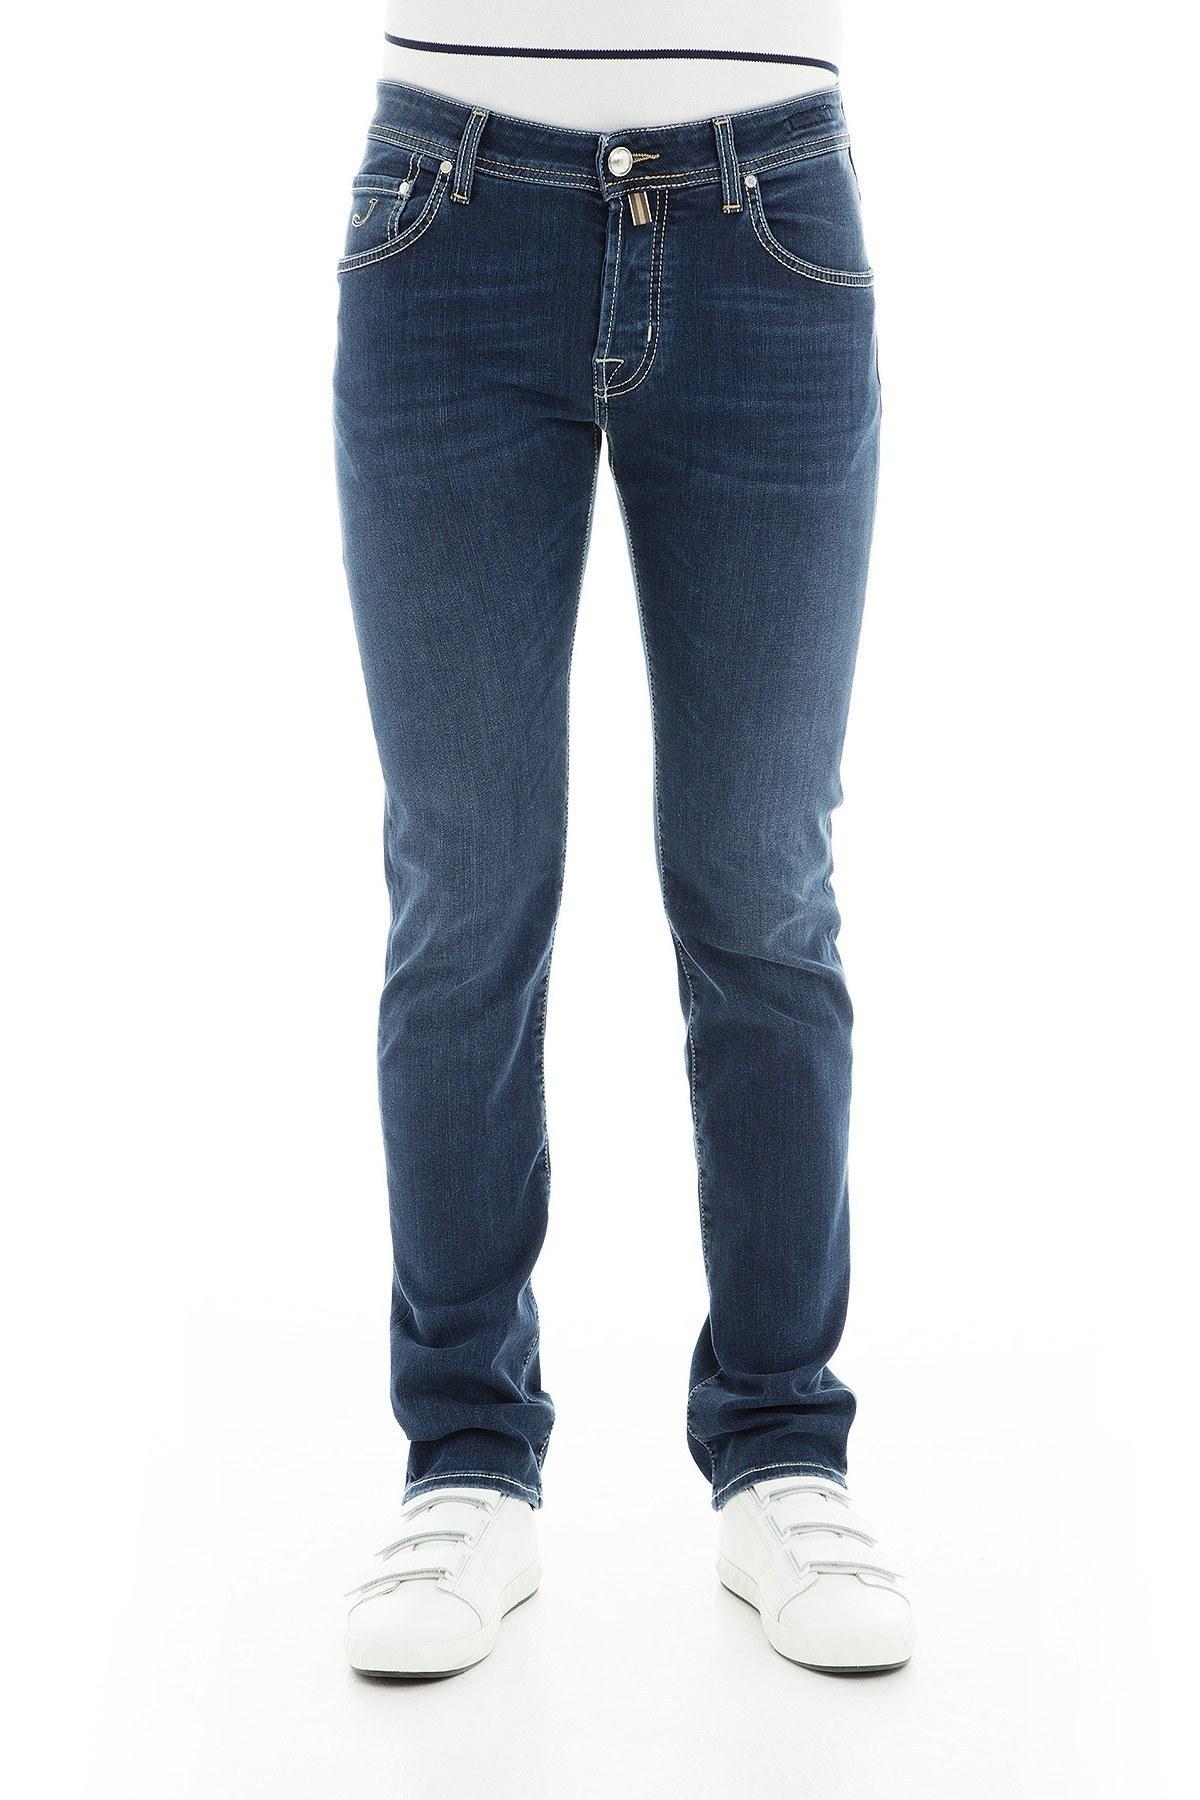 Jacob Cohen Jeans Erkek Kot Pantolon J62200514W2 C002 LACİVERT